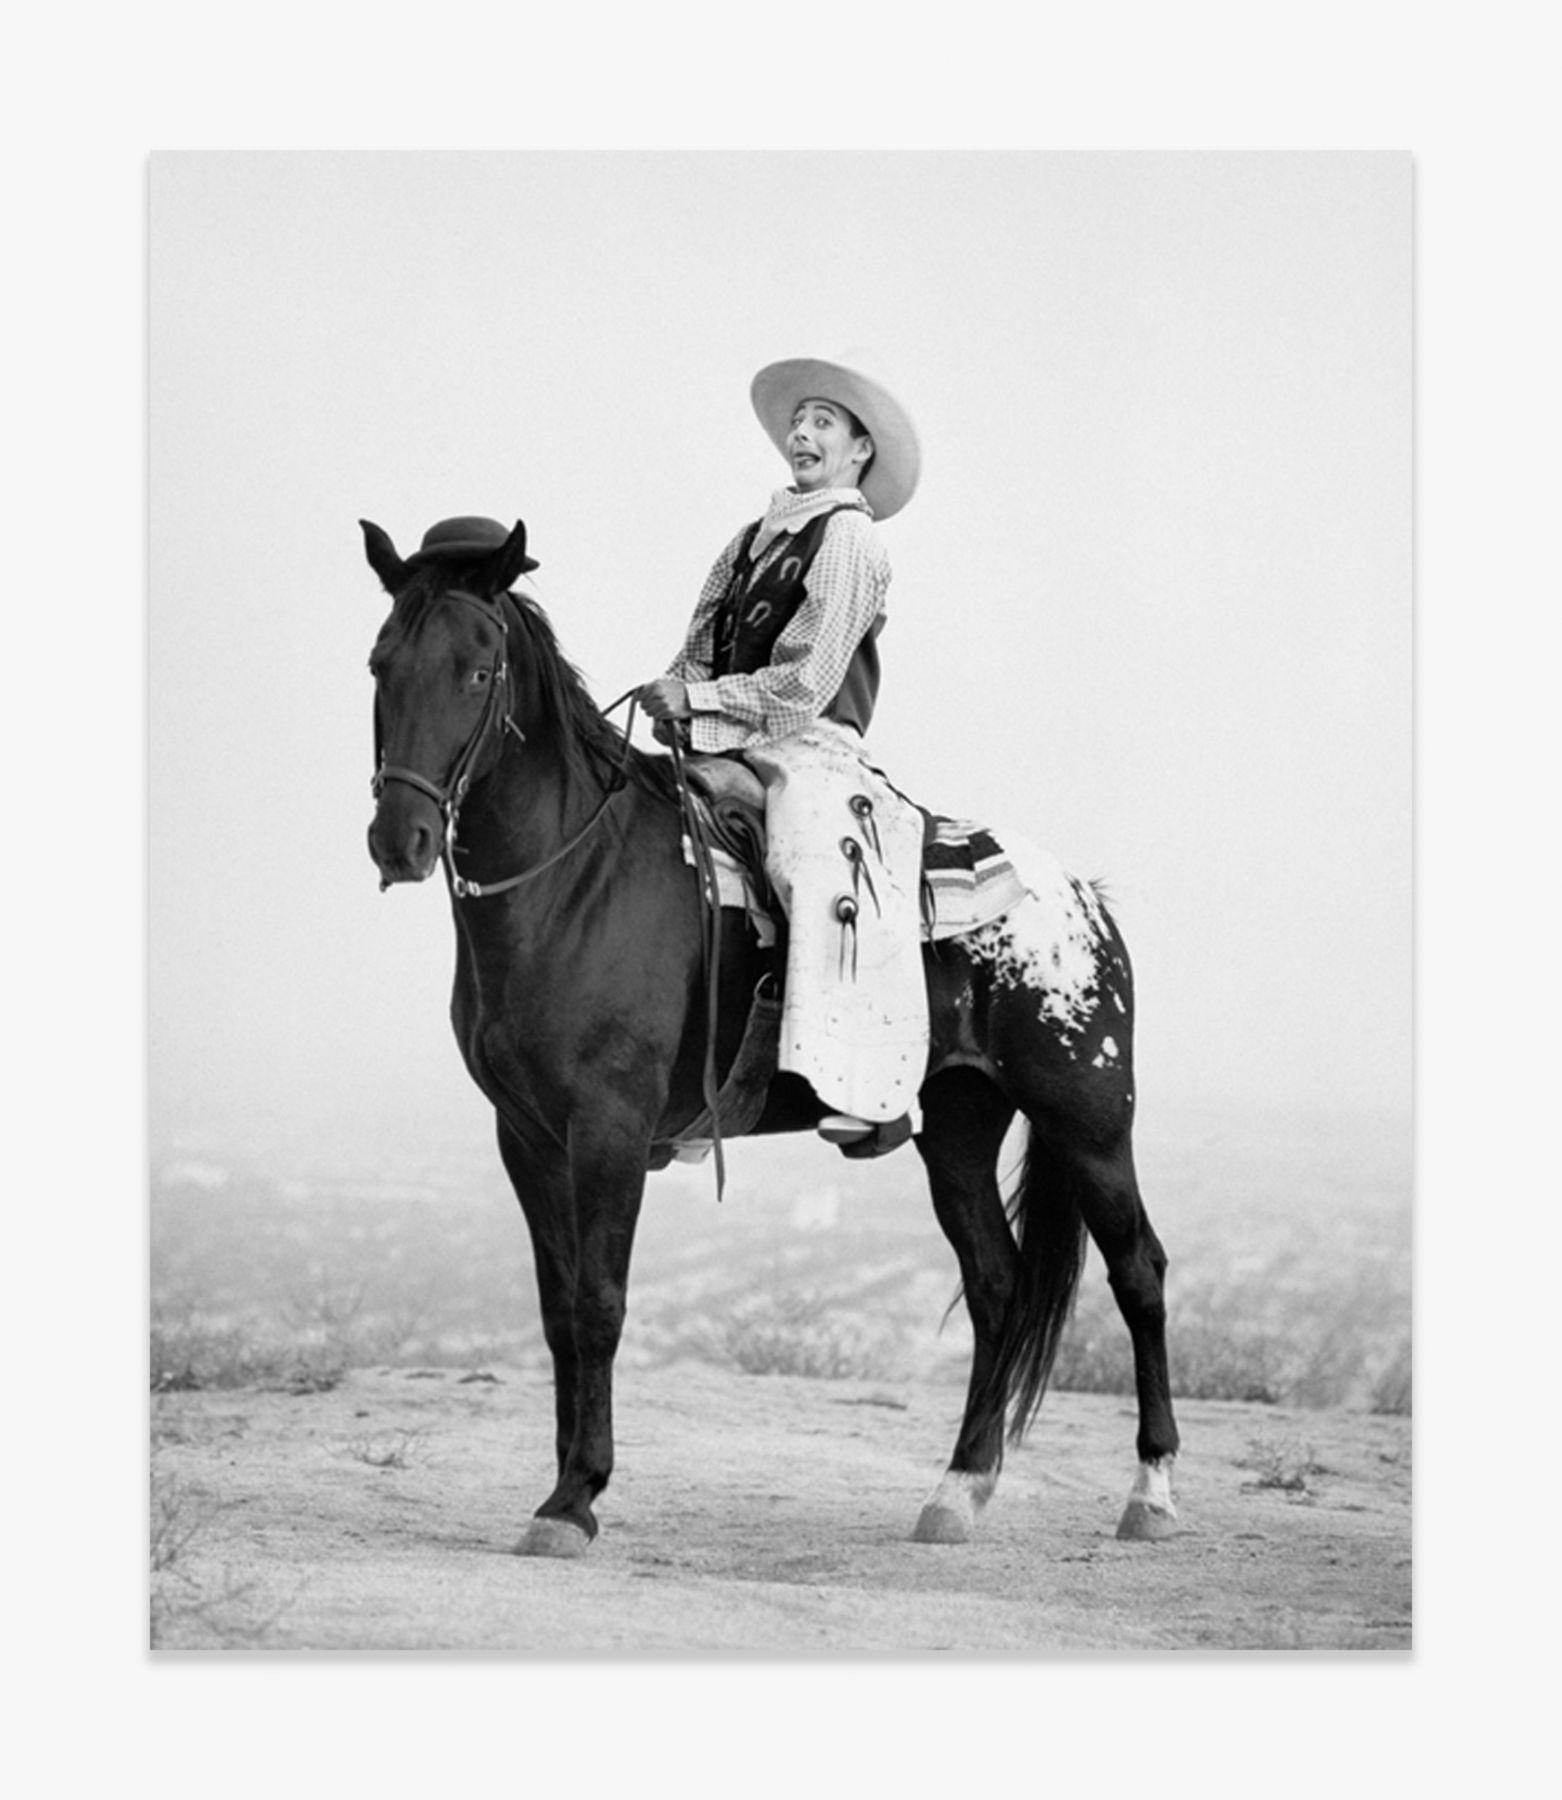 Herb Ritts Pee Wee on Horse, Los Angeles